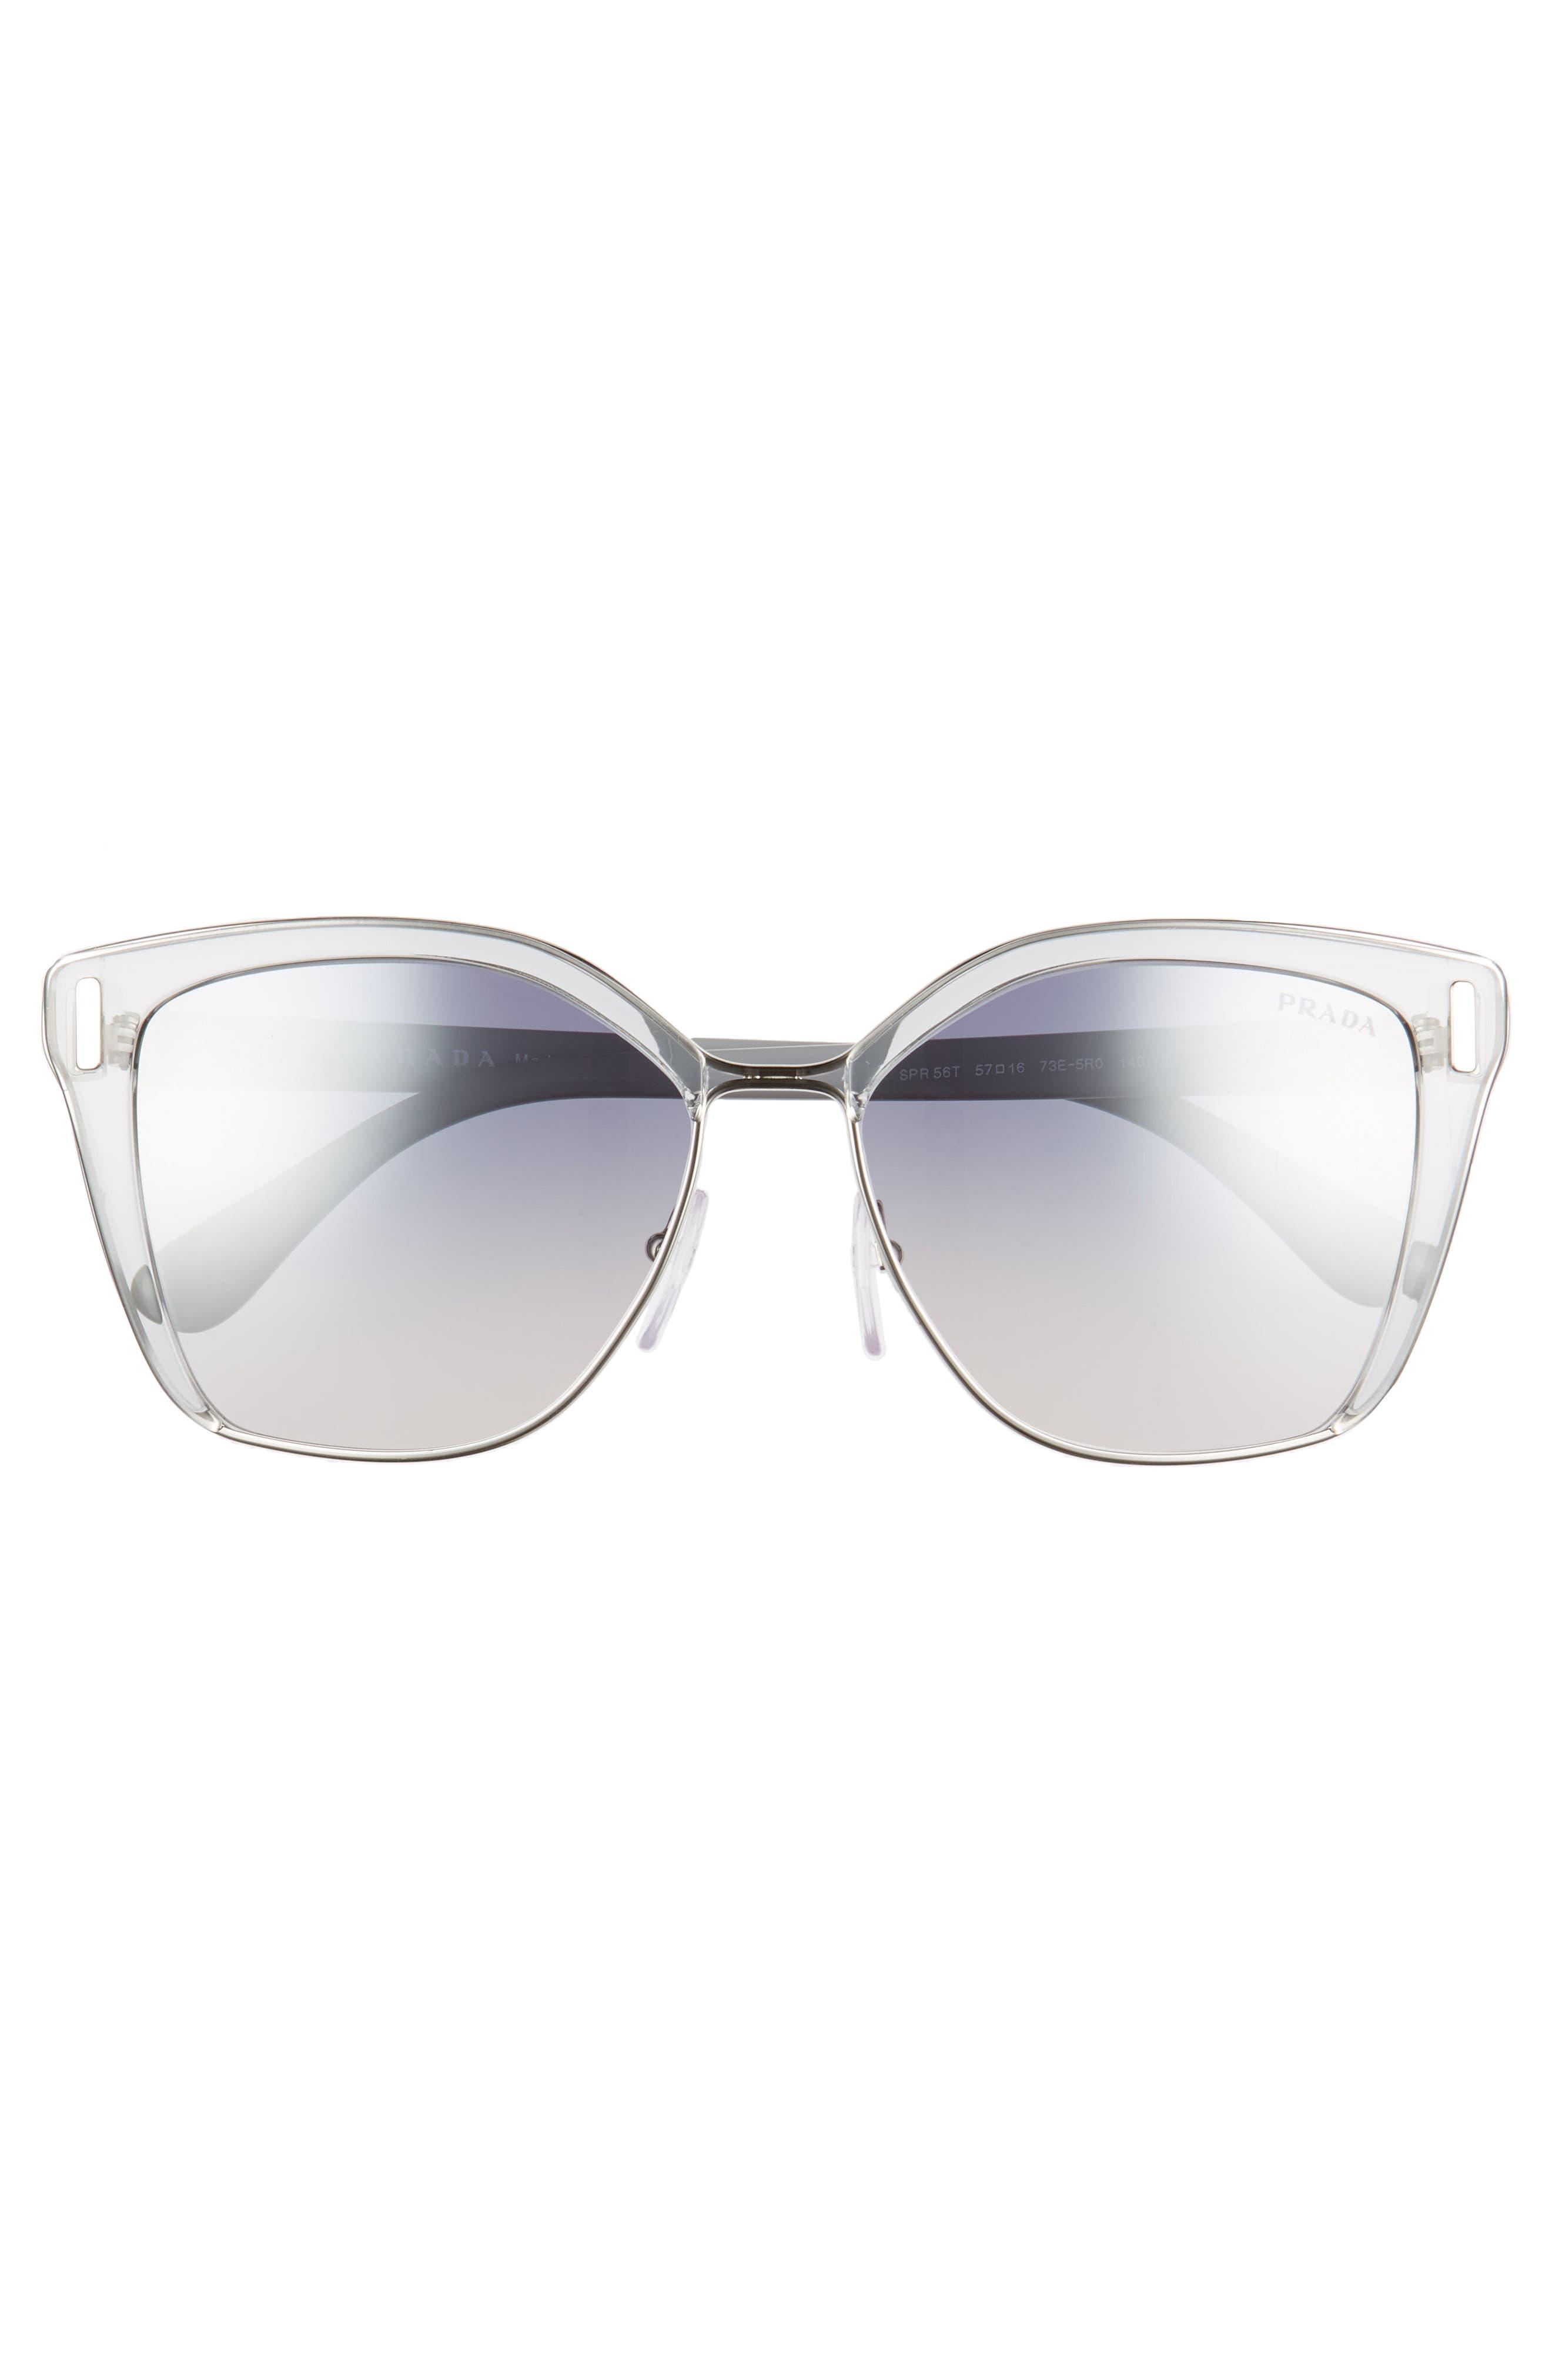 Alternate Image 3  - Prada 54mm Gradient Geometric Sunglasses